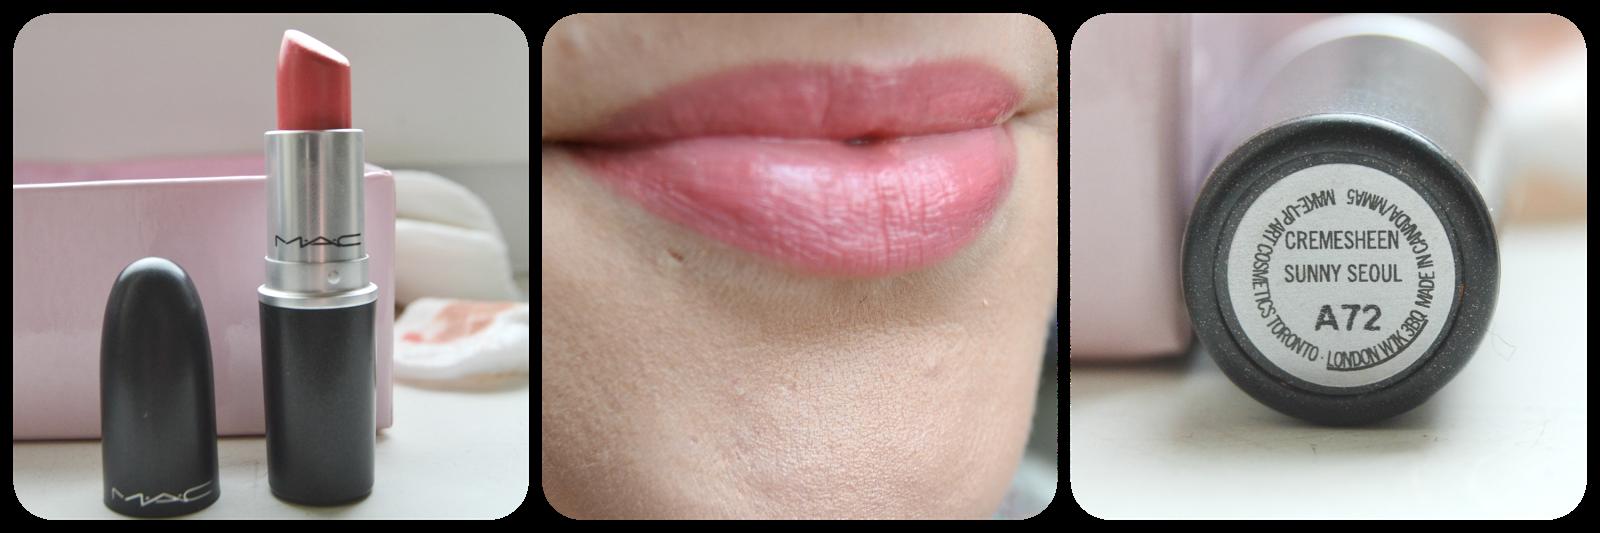 Mac, Cosmetics, Lipstick, Lippenstift, Swatch, Sunny Seoul, Swatches, Lipswatch, Cremesheen